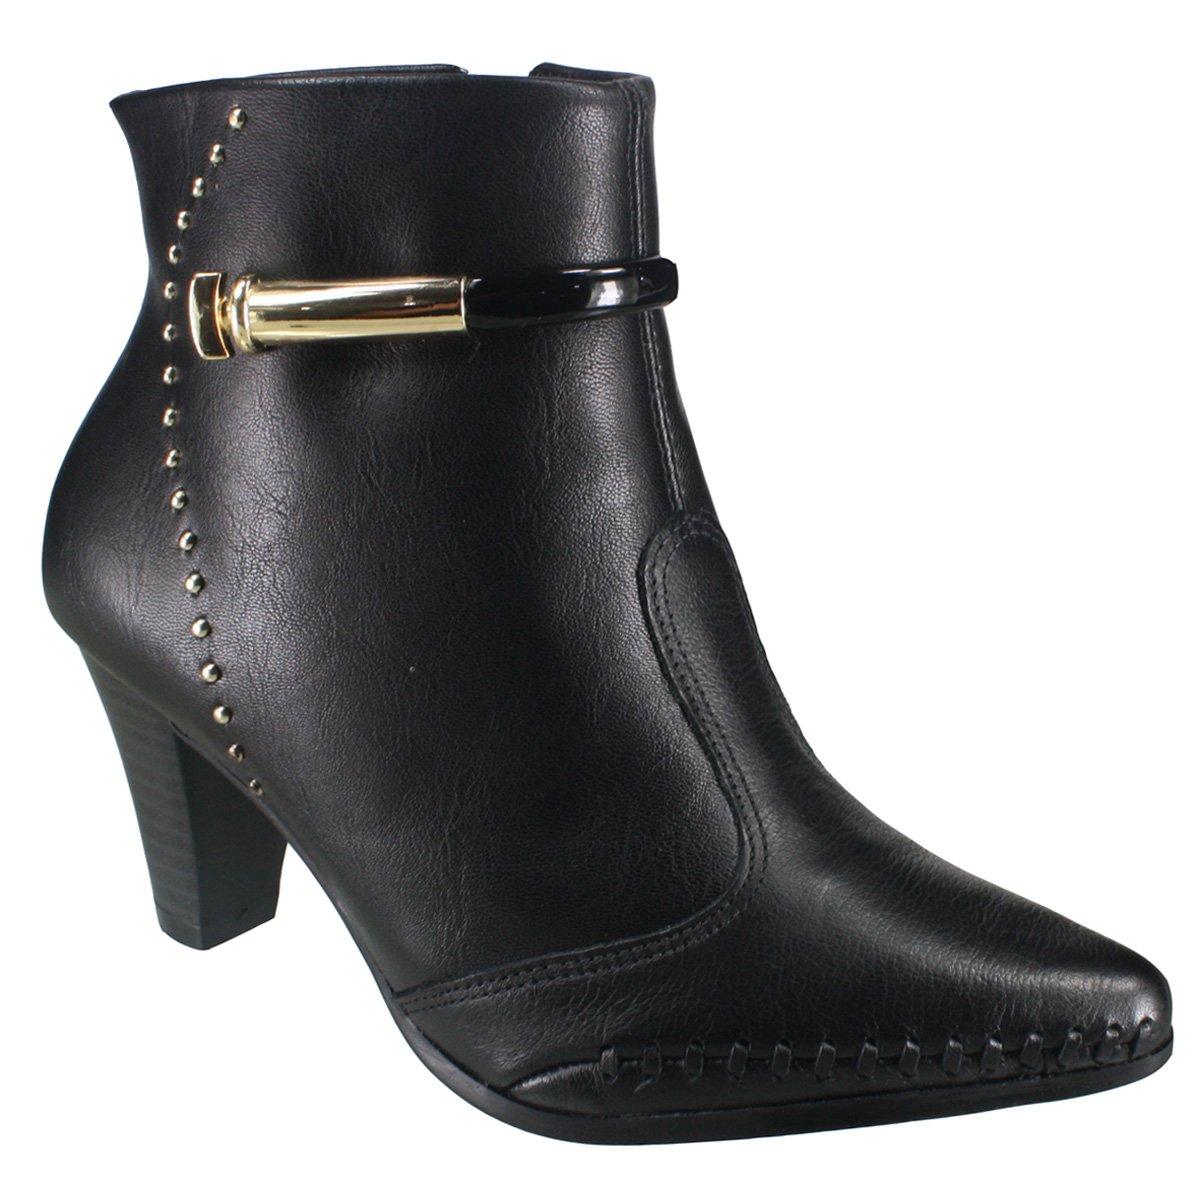 3f17062f7 Bota Ramarim Ankle Boot 18-15101 000001 - Preto (Naturale Soft ...